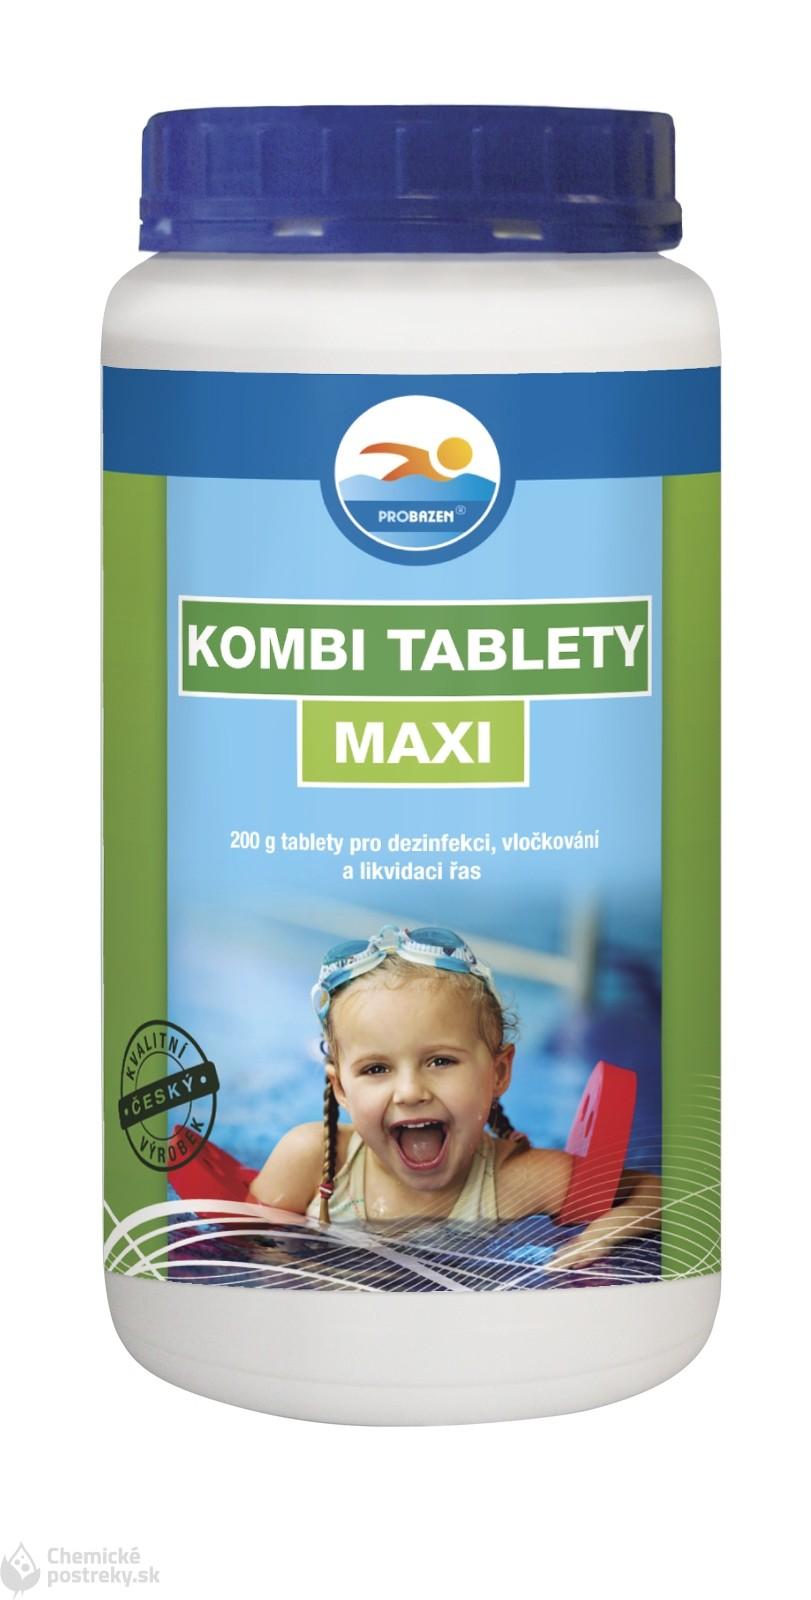 PROBAZEN KOMBI TABLETY MAXI 1 kg